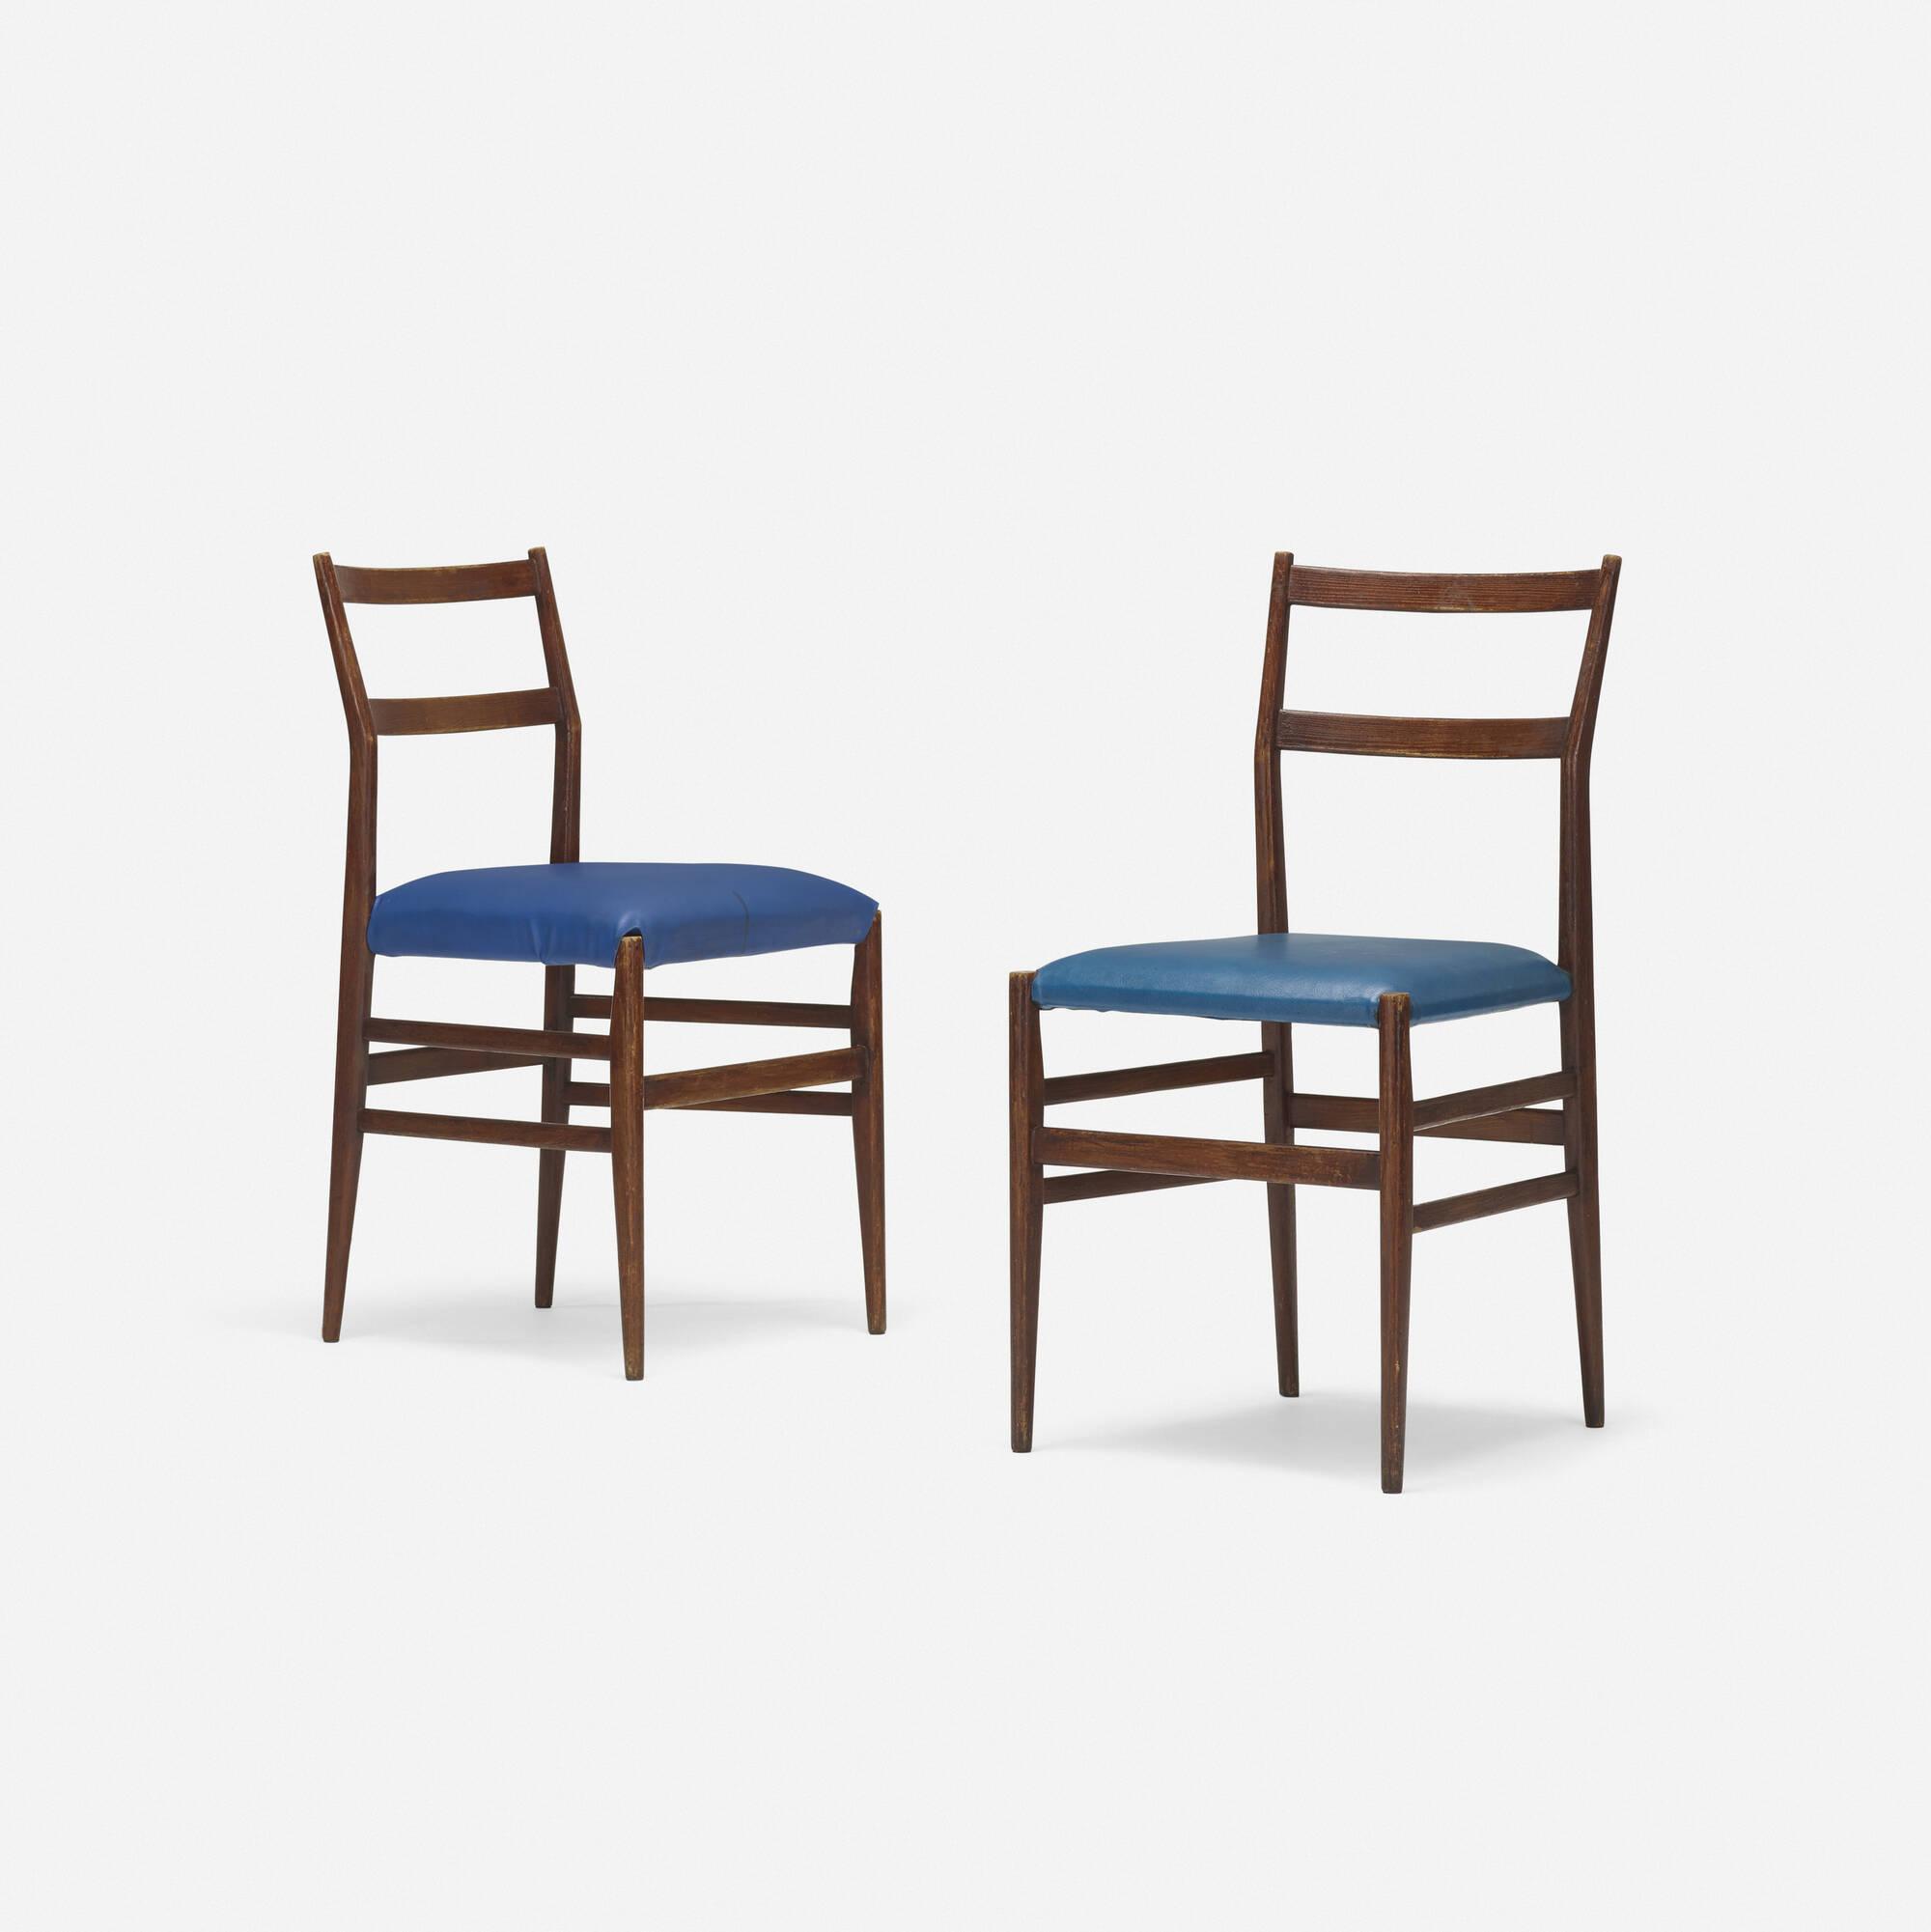 279: Gio Ponti / Leggera Chairs, Pair (1 Of 2)